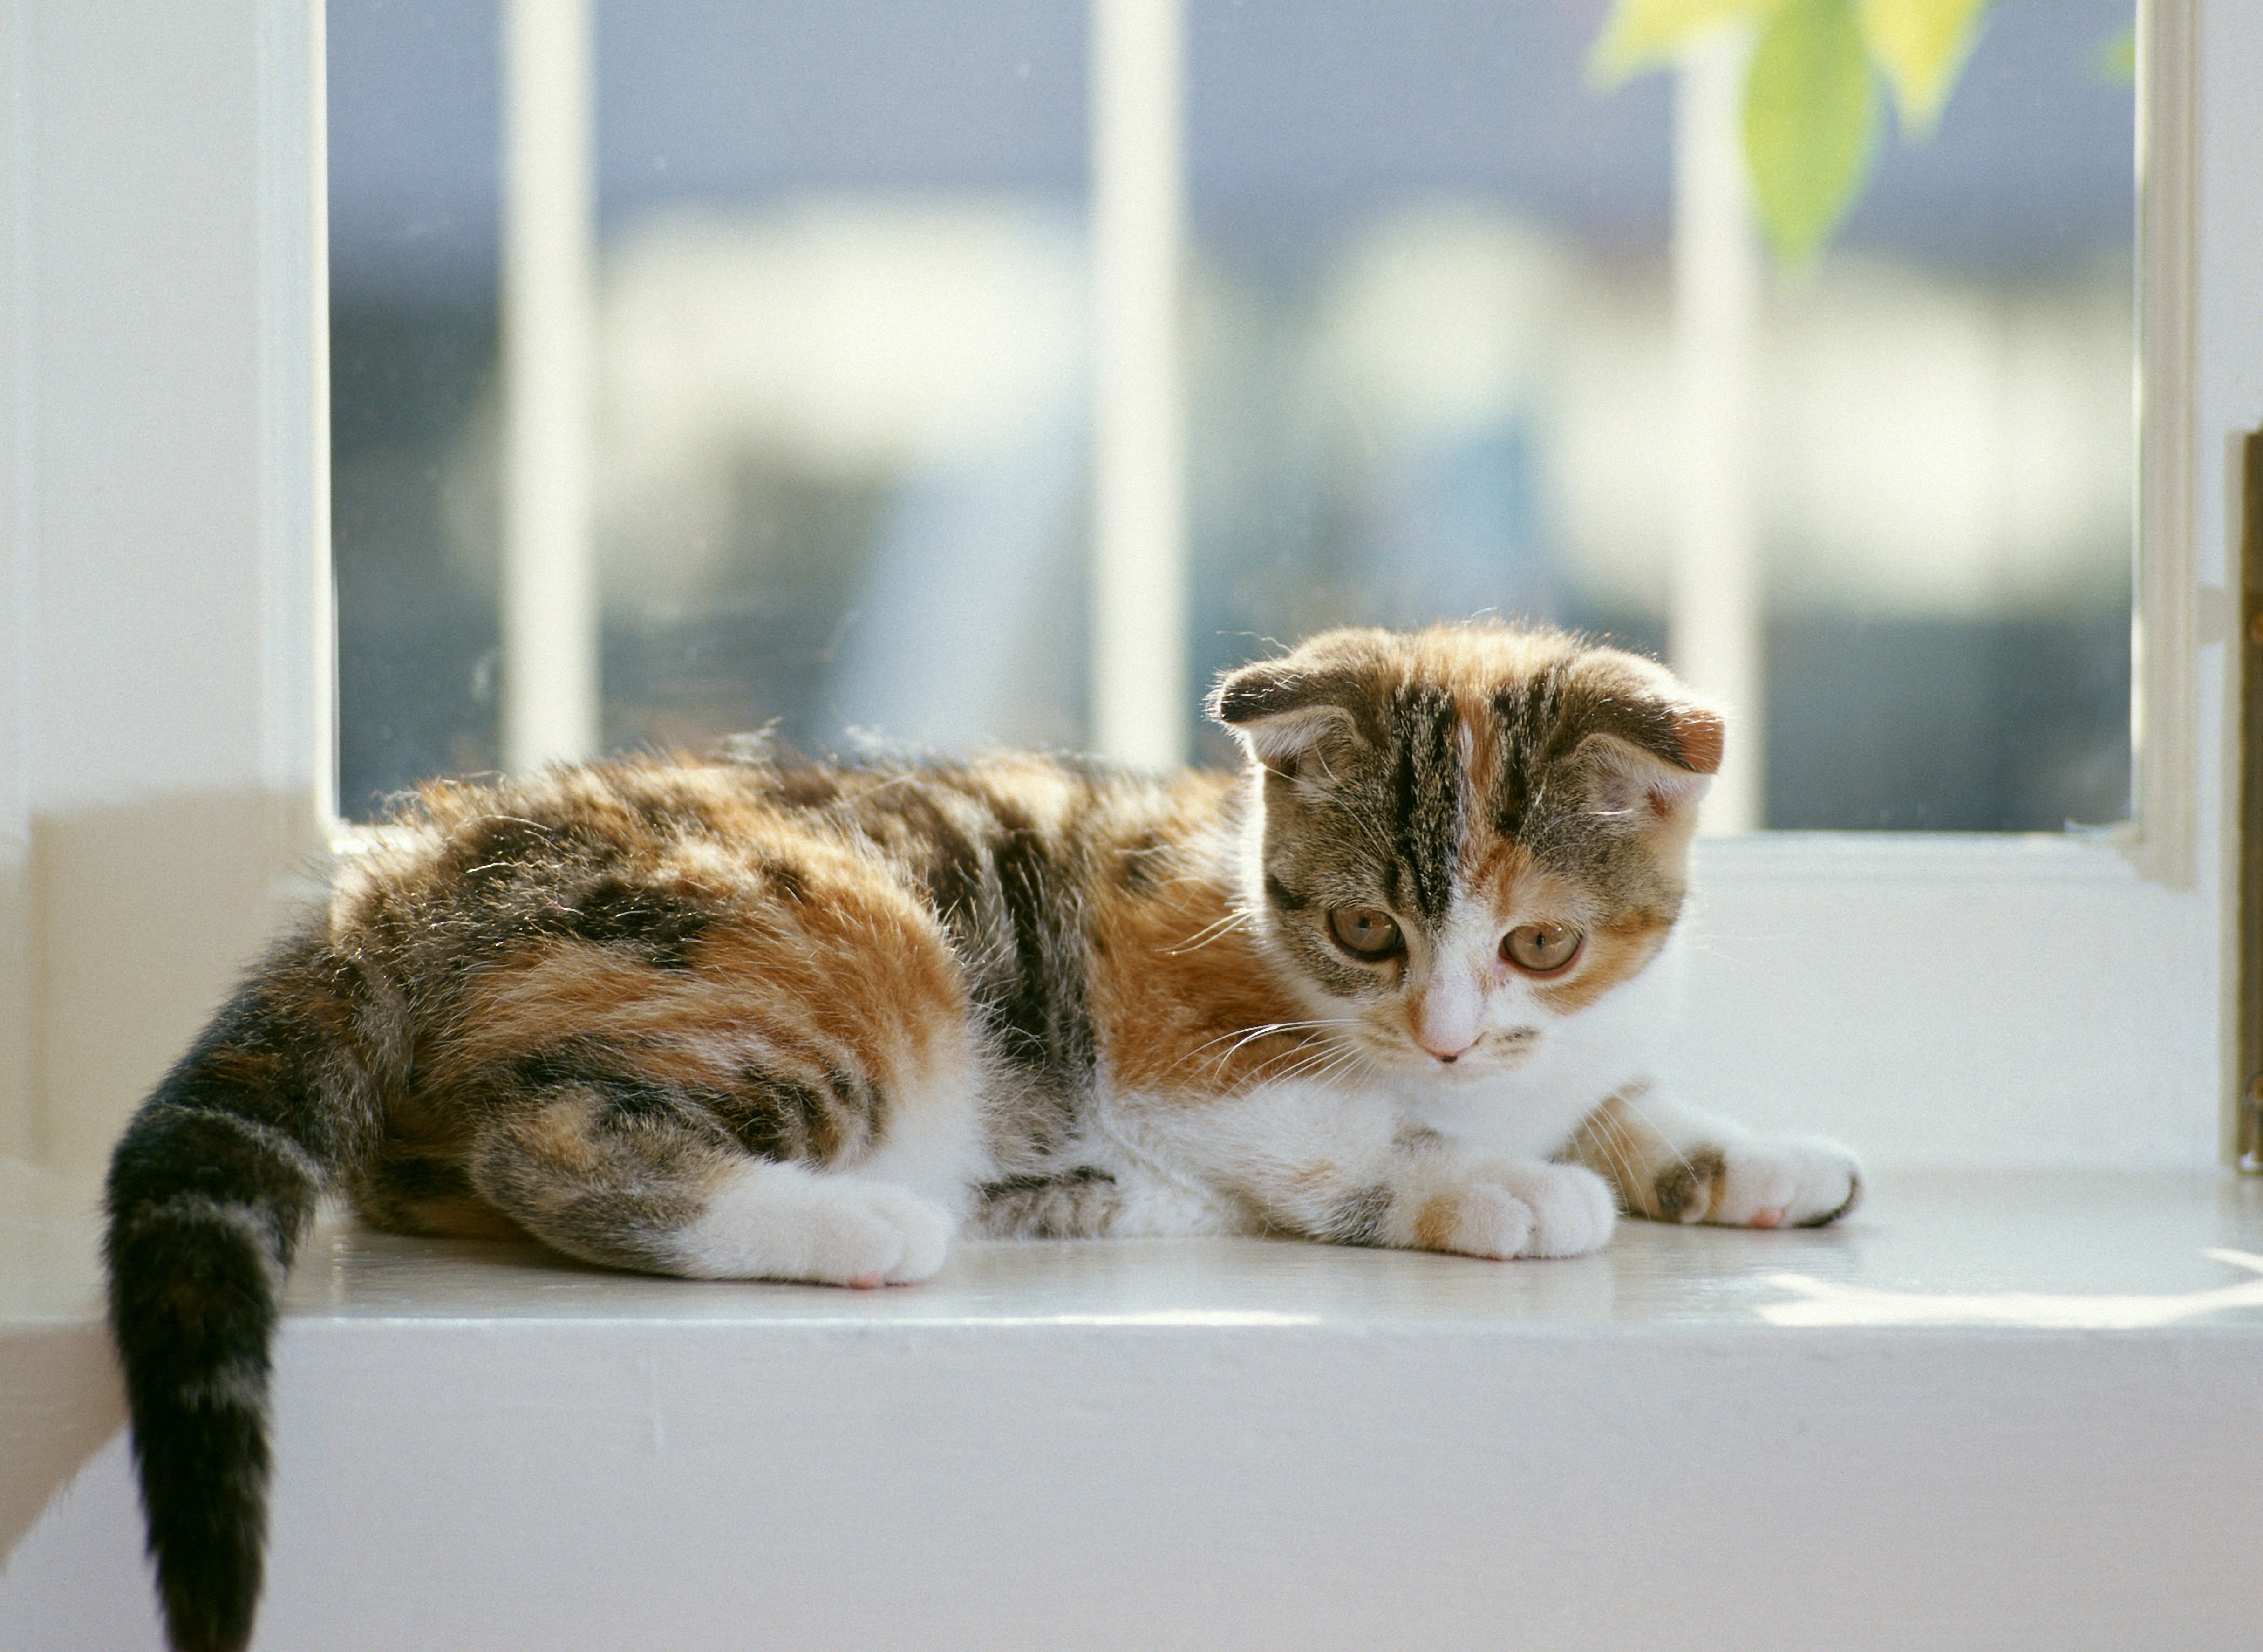 котята на окне kittens on the window  № 3063186 загрузить